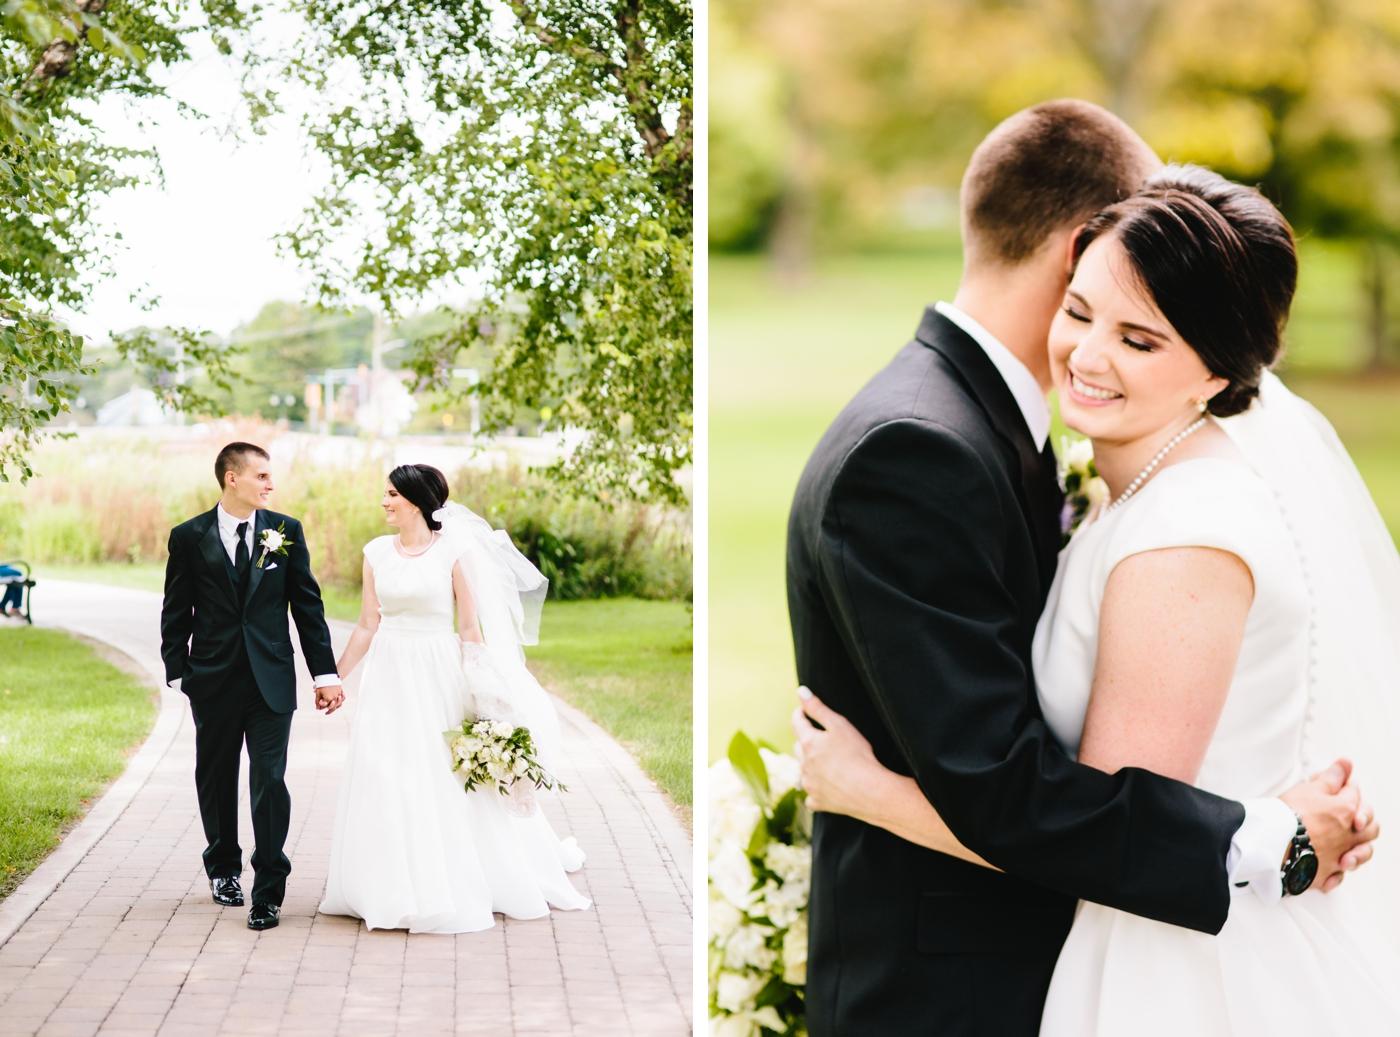 chicago-fine-art-wedding-photography-mccarthy30